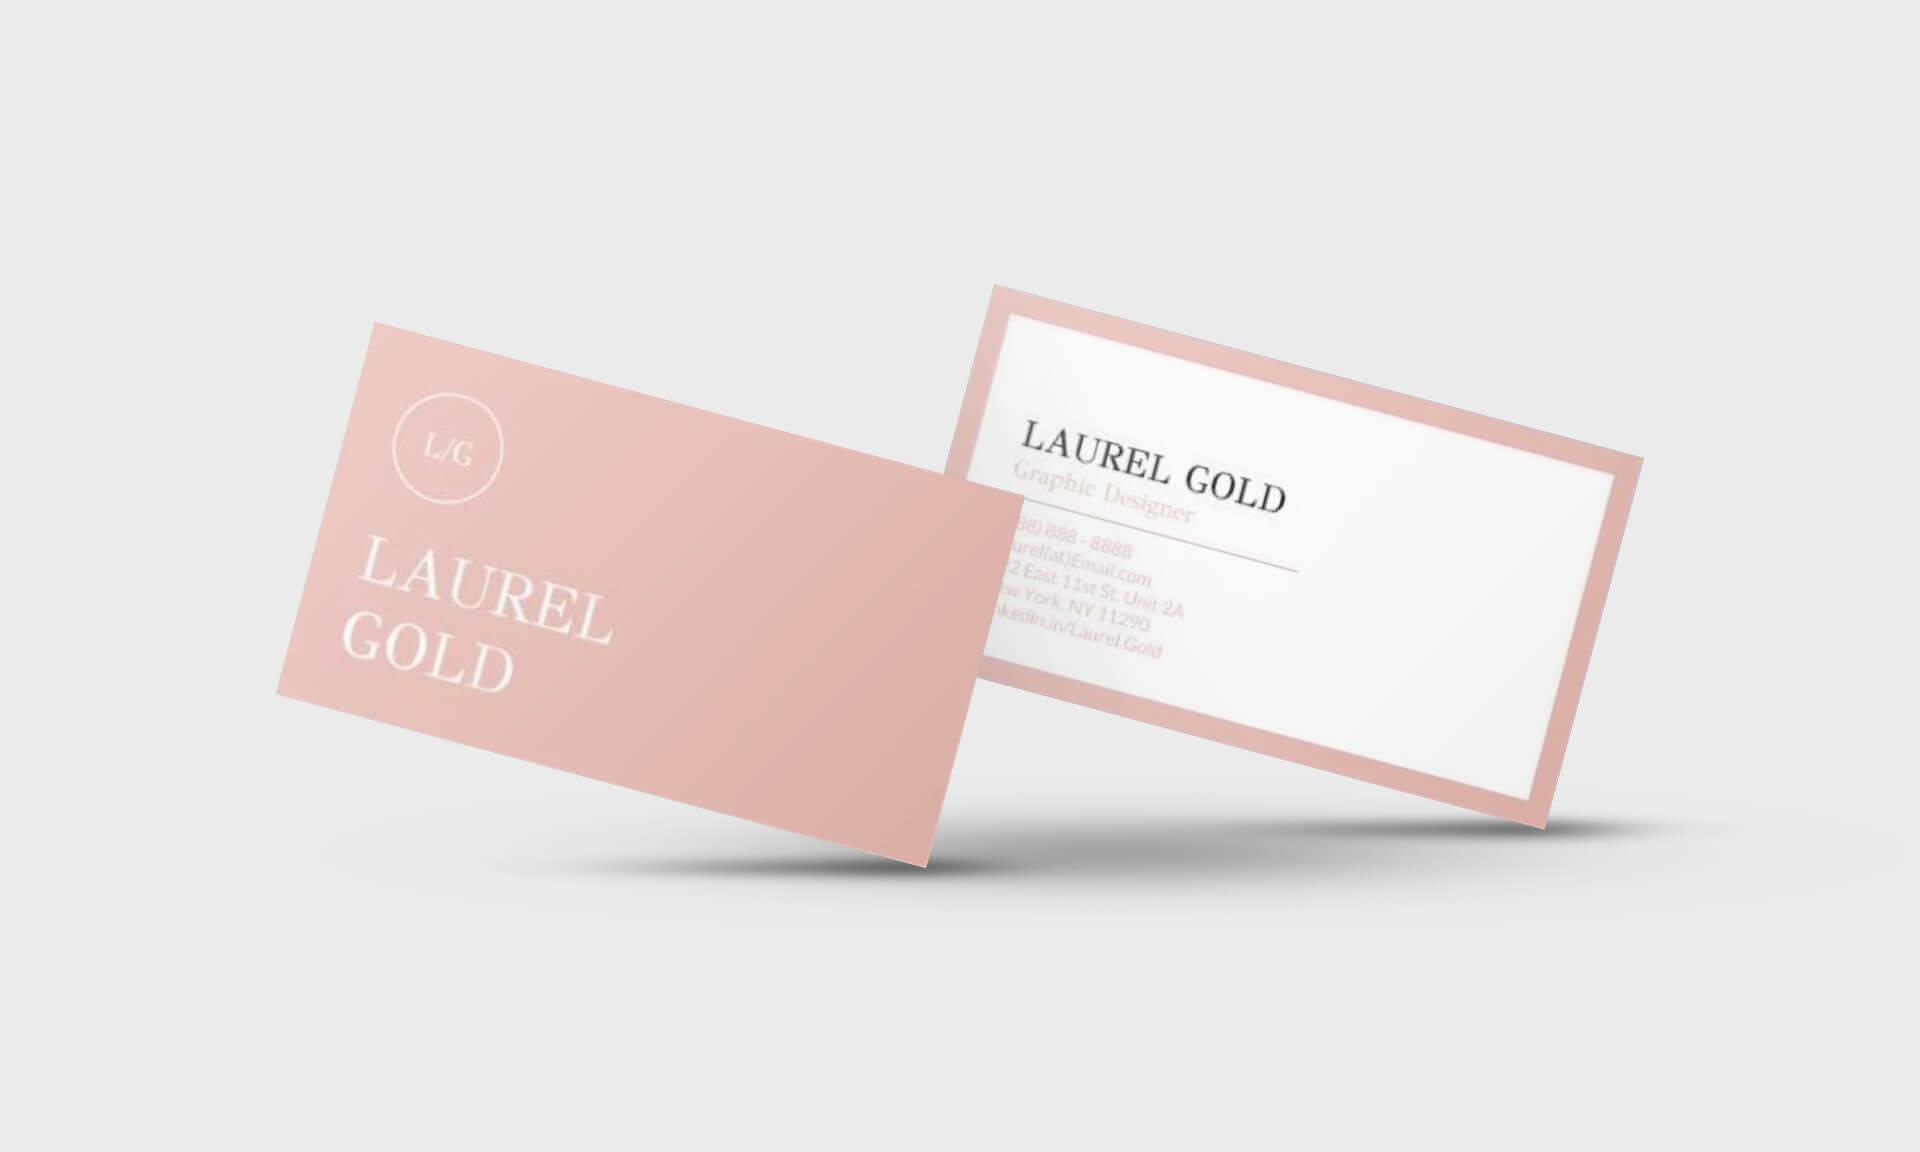 Laurel Gold Google Docs Business Card Template - Stand Out Shop With Business Card Template For Google Docs